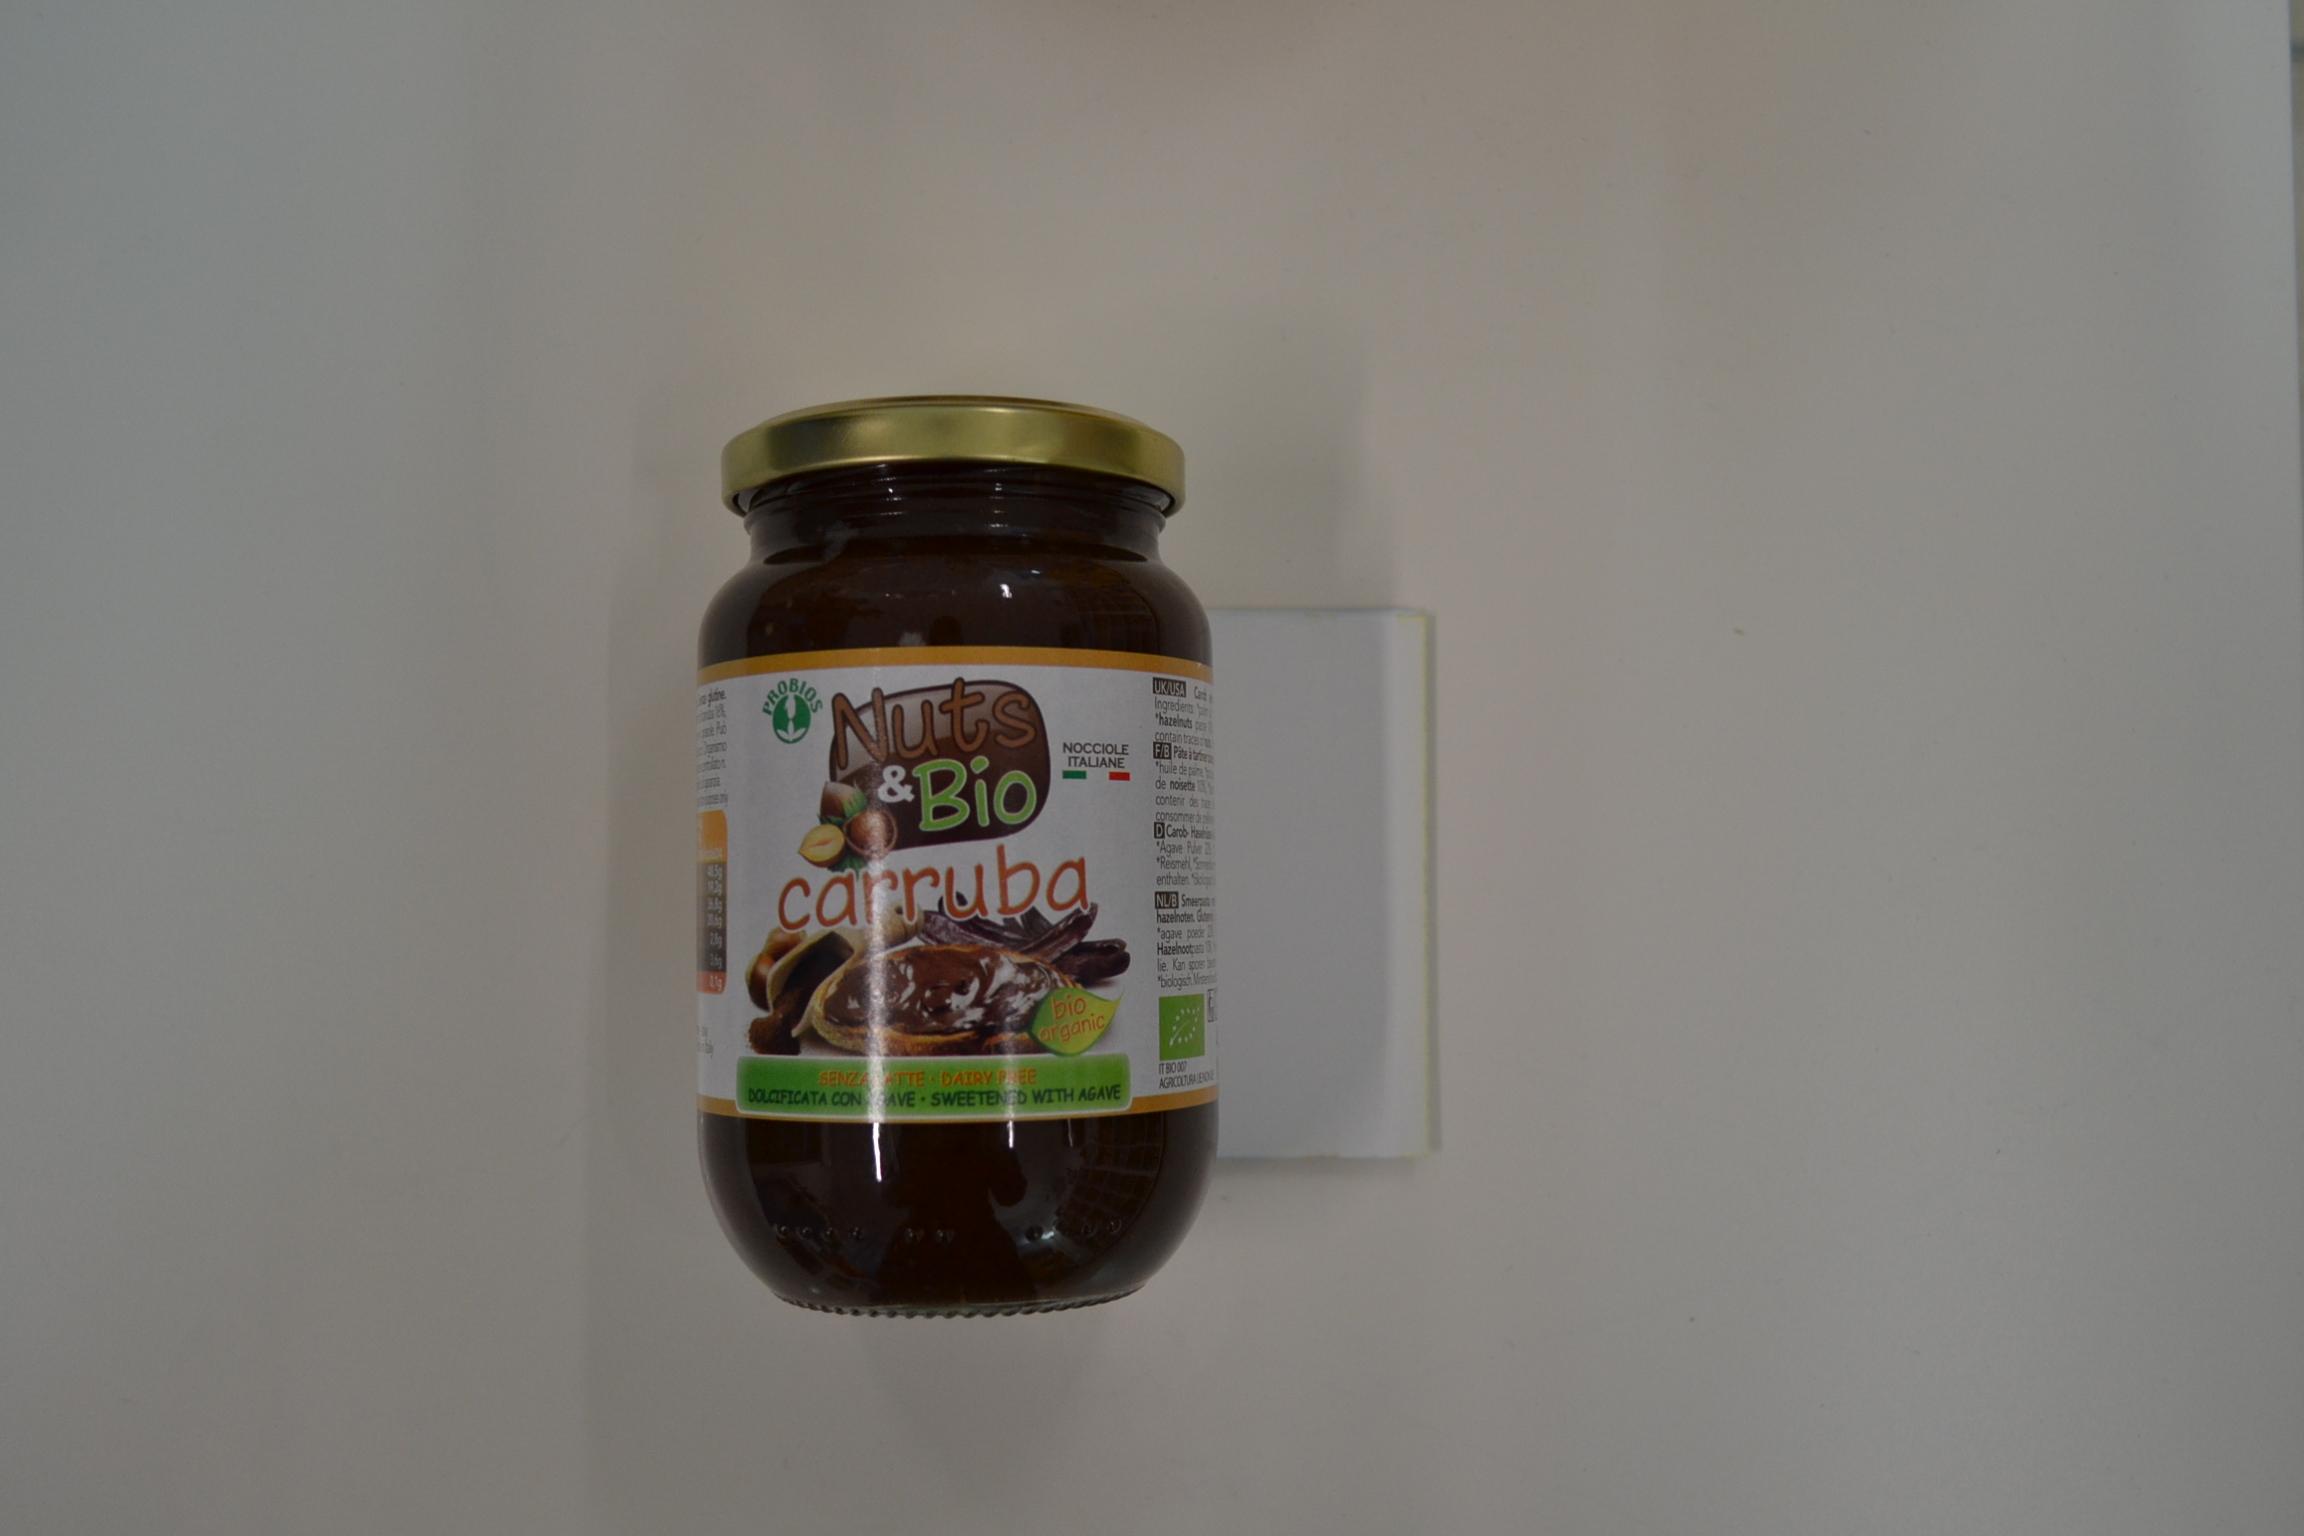 Nutella NUTS&BIO (carruba) € 7,40